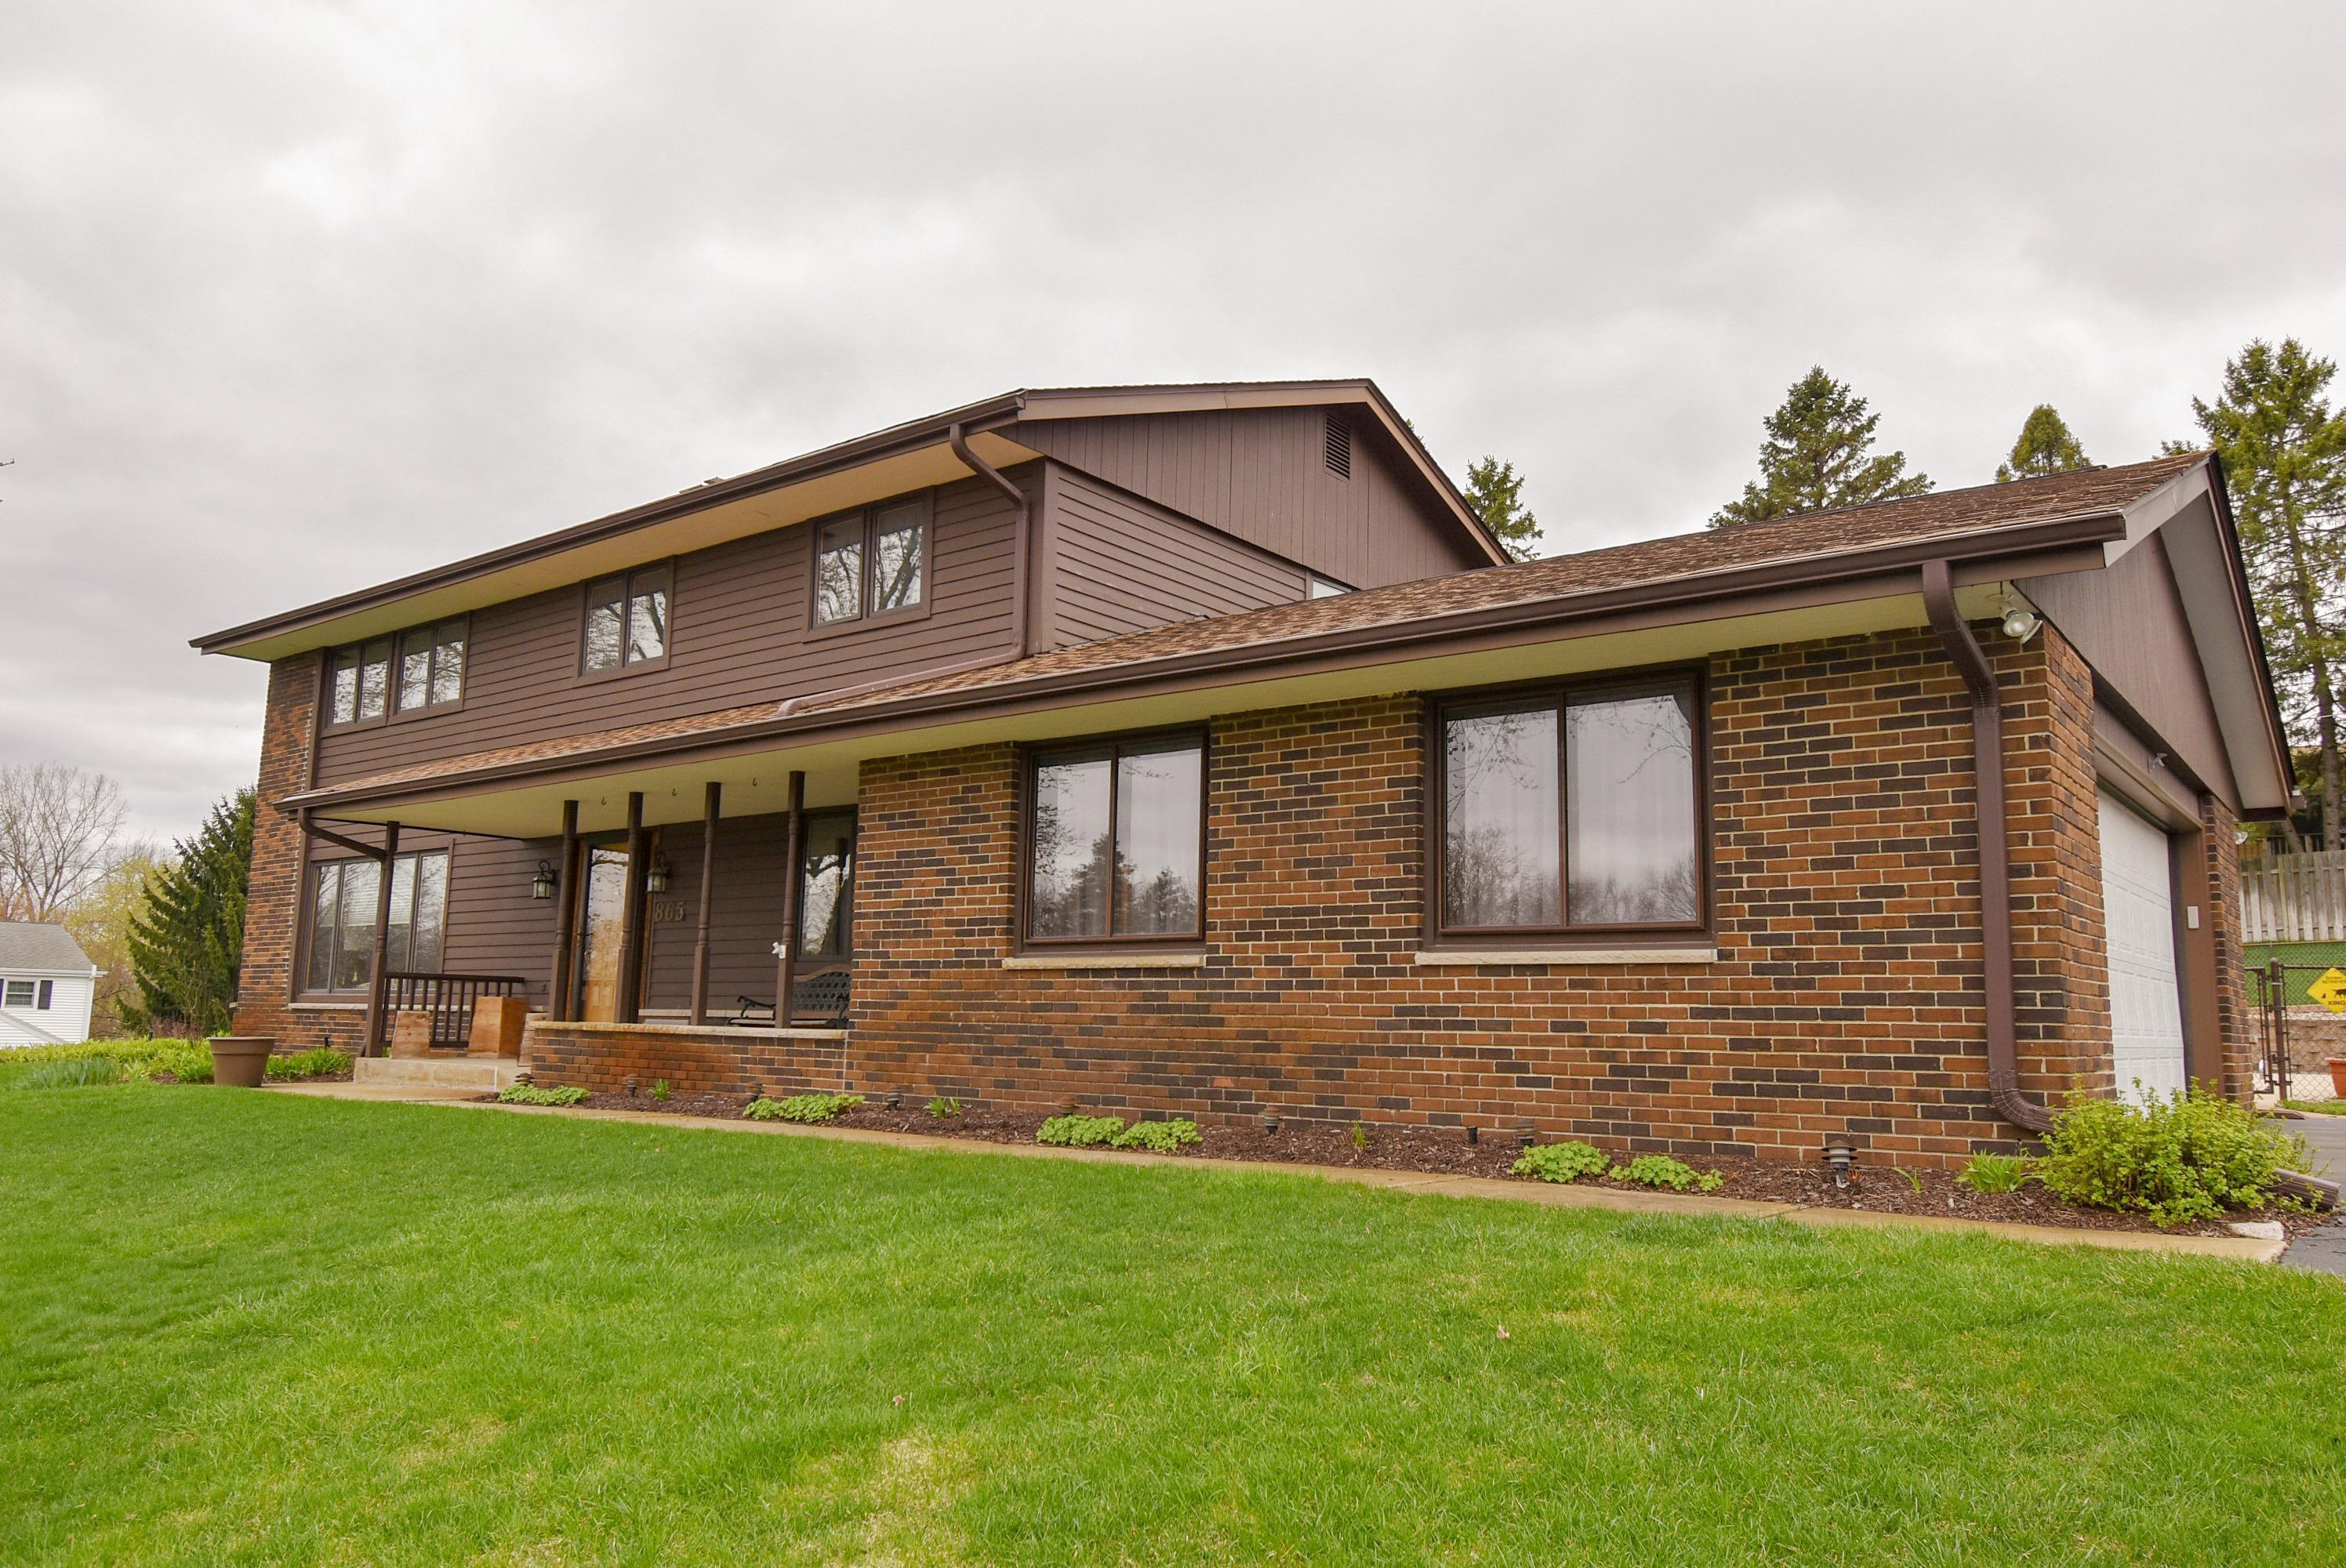 865 Russett Dr, Brookfield, Wisconsin 53045, 4 Bedrooms Bedrooms, 9 Rooms Rooms,2 BathroomsBathrooms,Single-Family,For Sale,Russett Dr,1735411